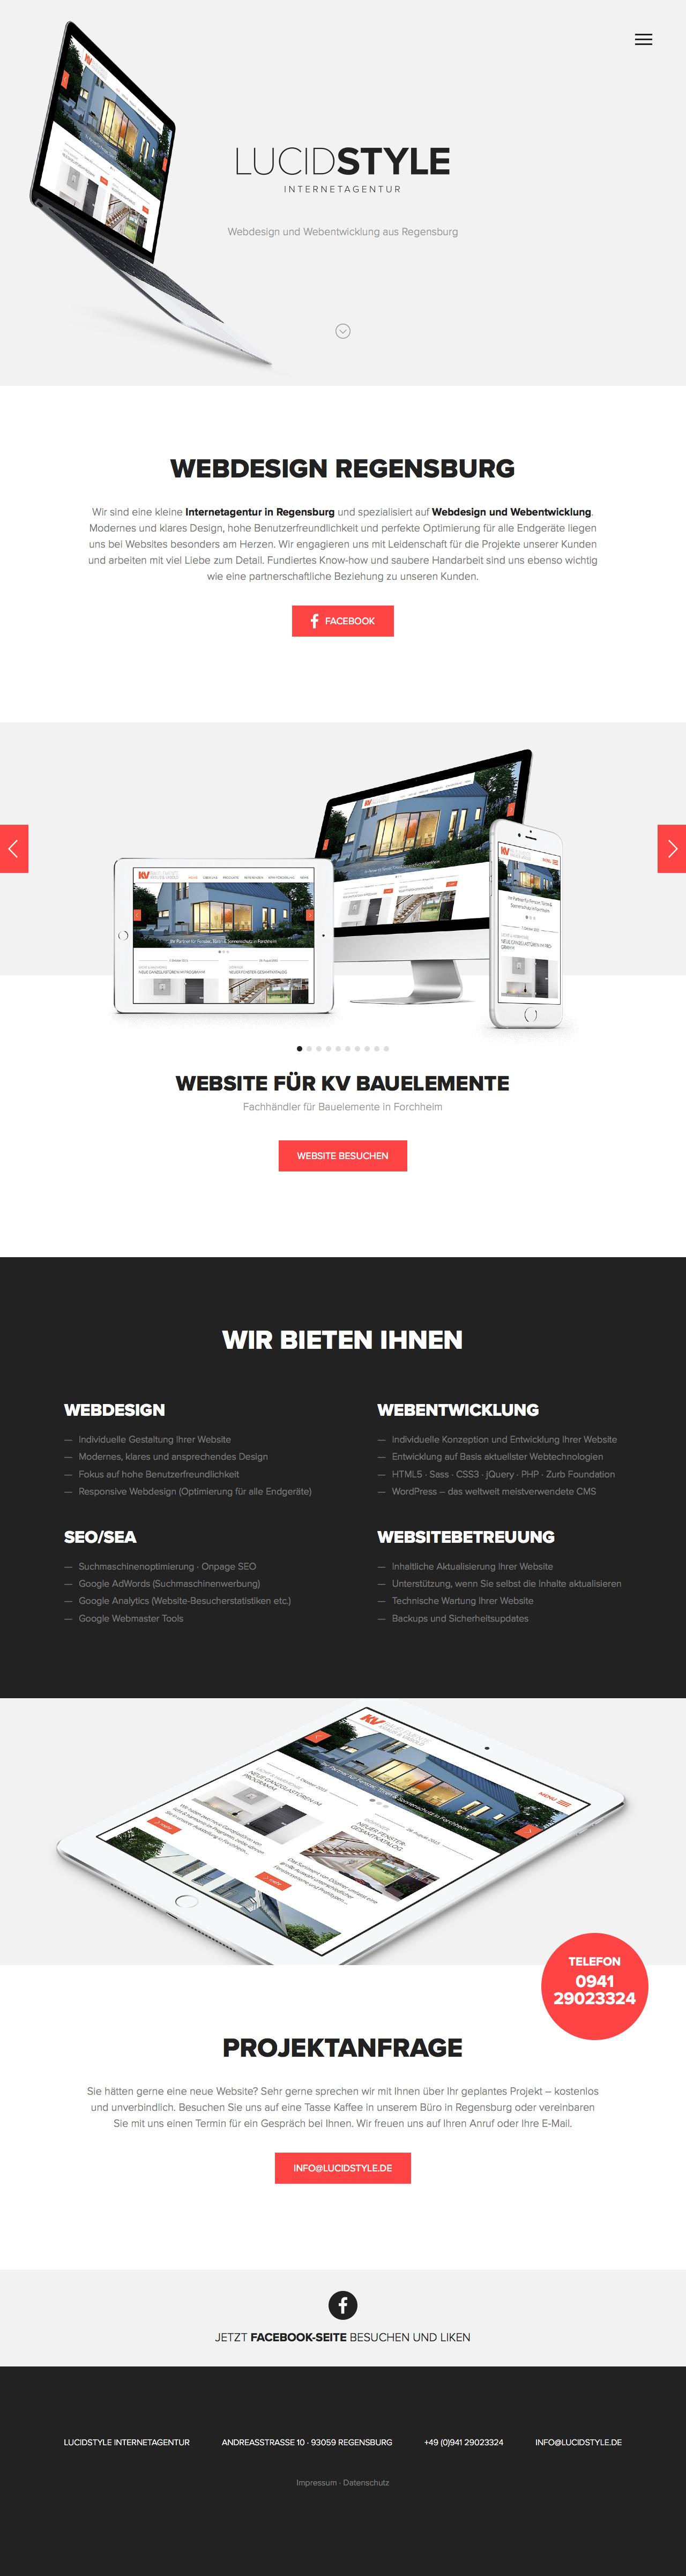 Lucidstyle Internetagentur Website Screenshot